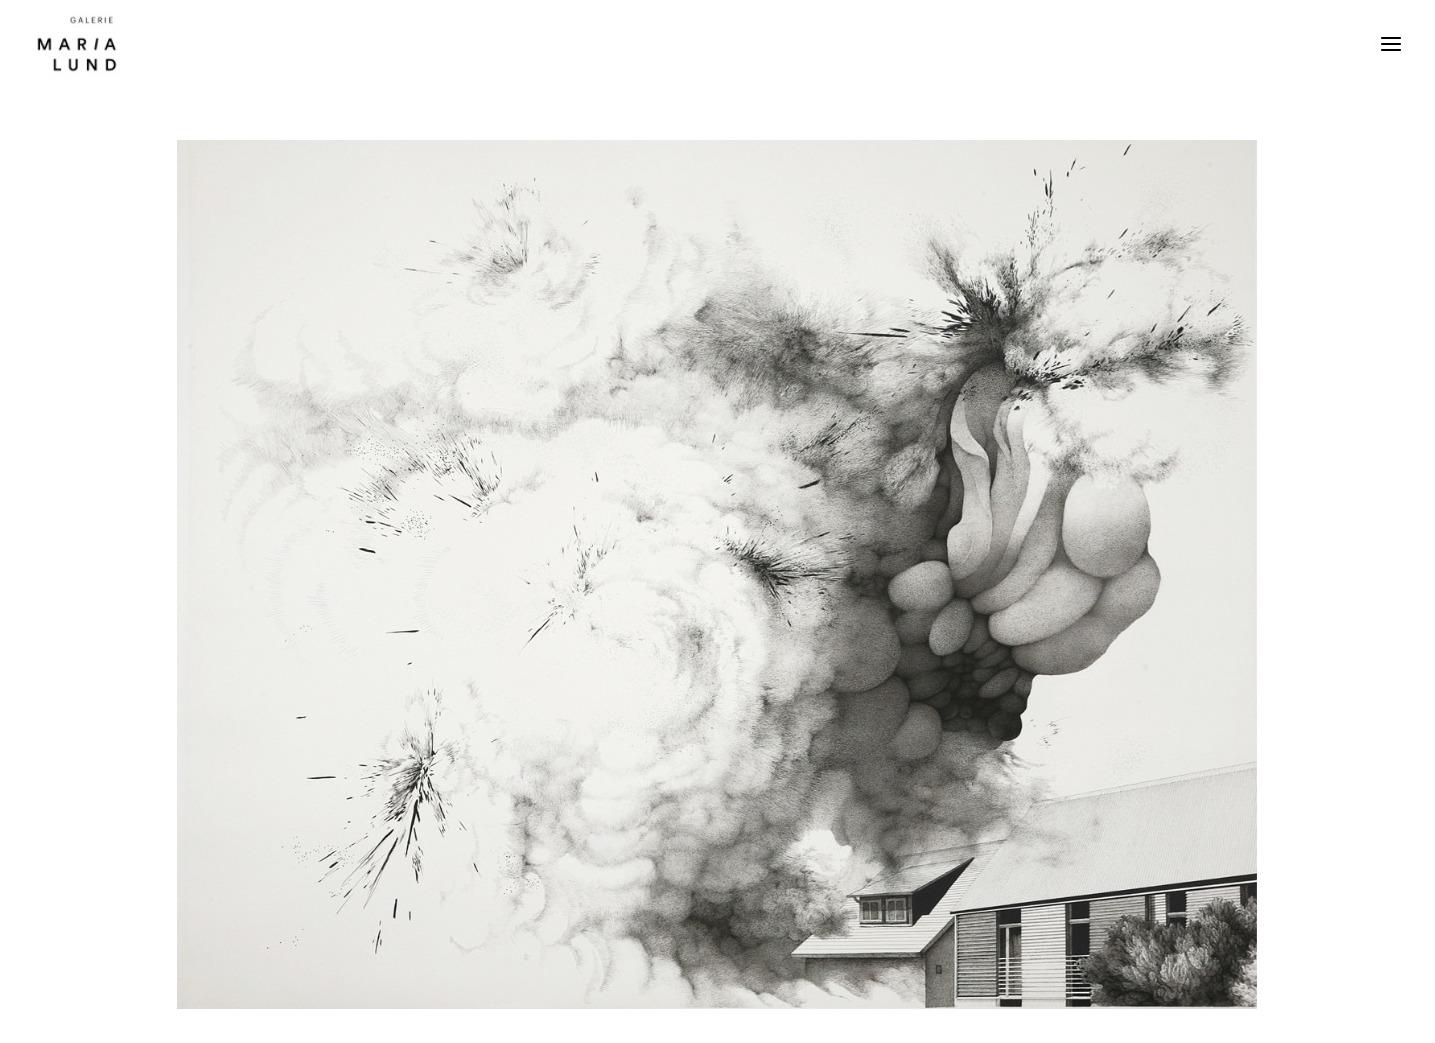 Refonte de site Galerie MariaLund - Min Jung-Yeon - In blossom